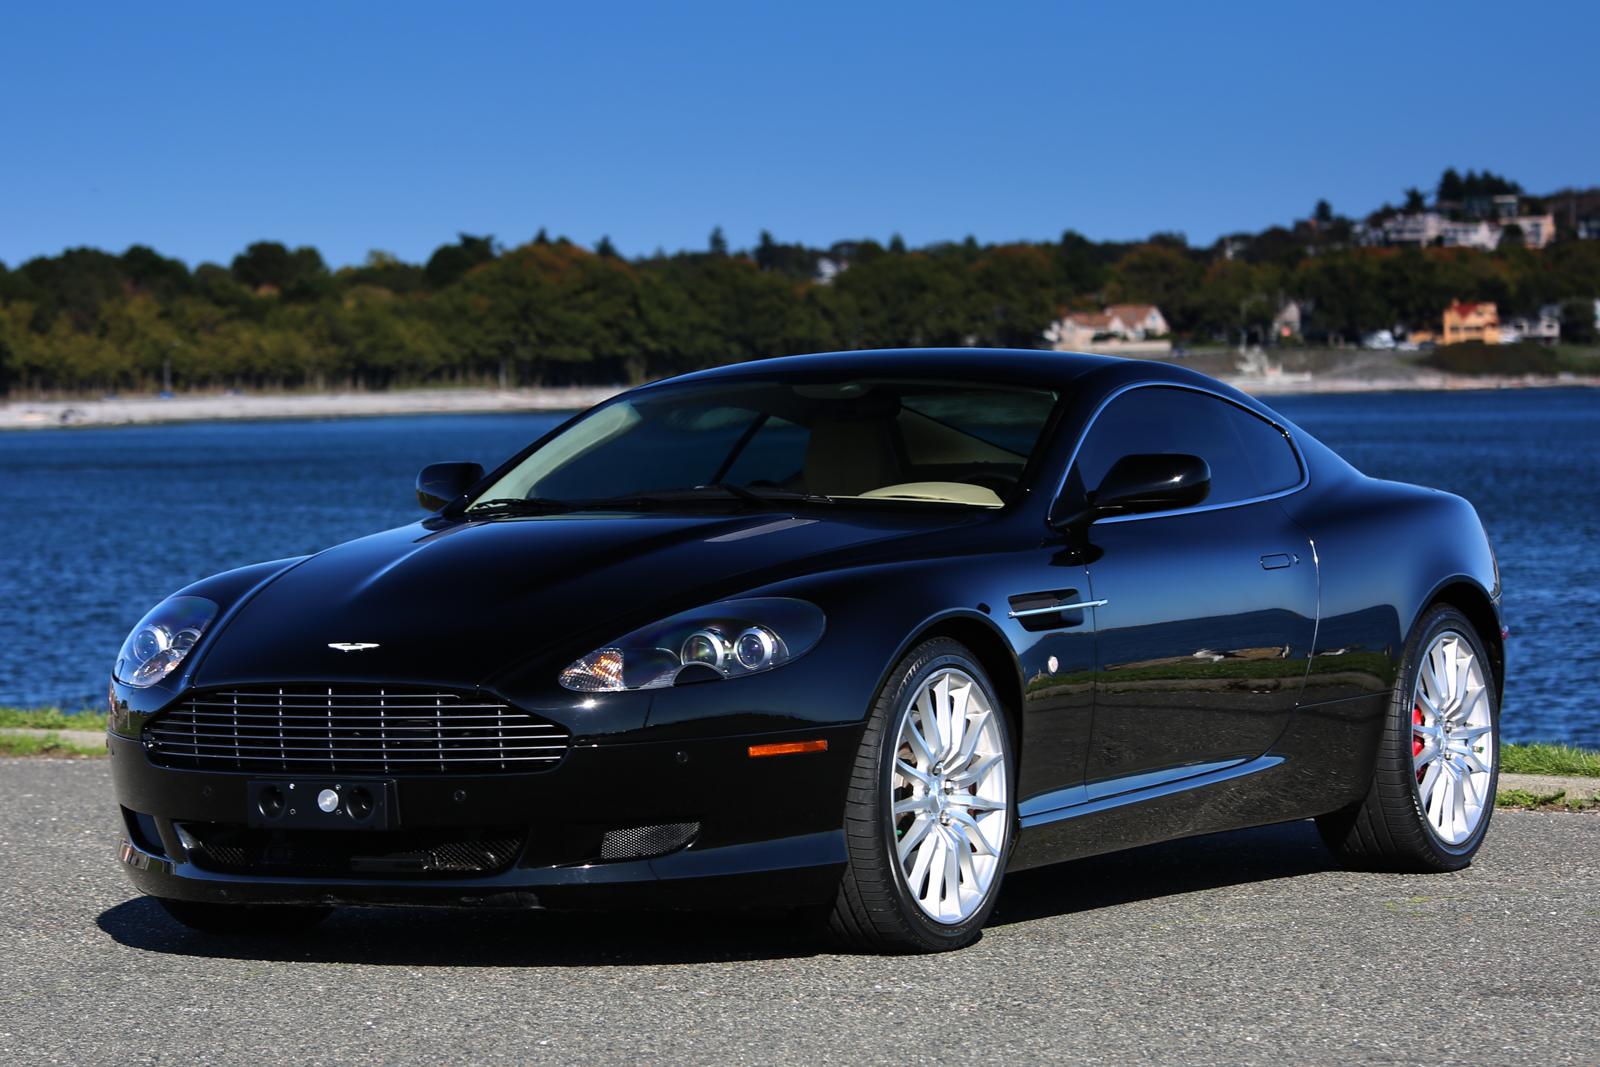 2007 Aston Martin DB9 for sale